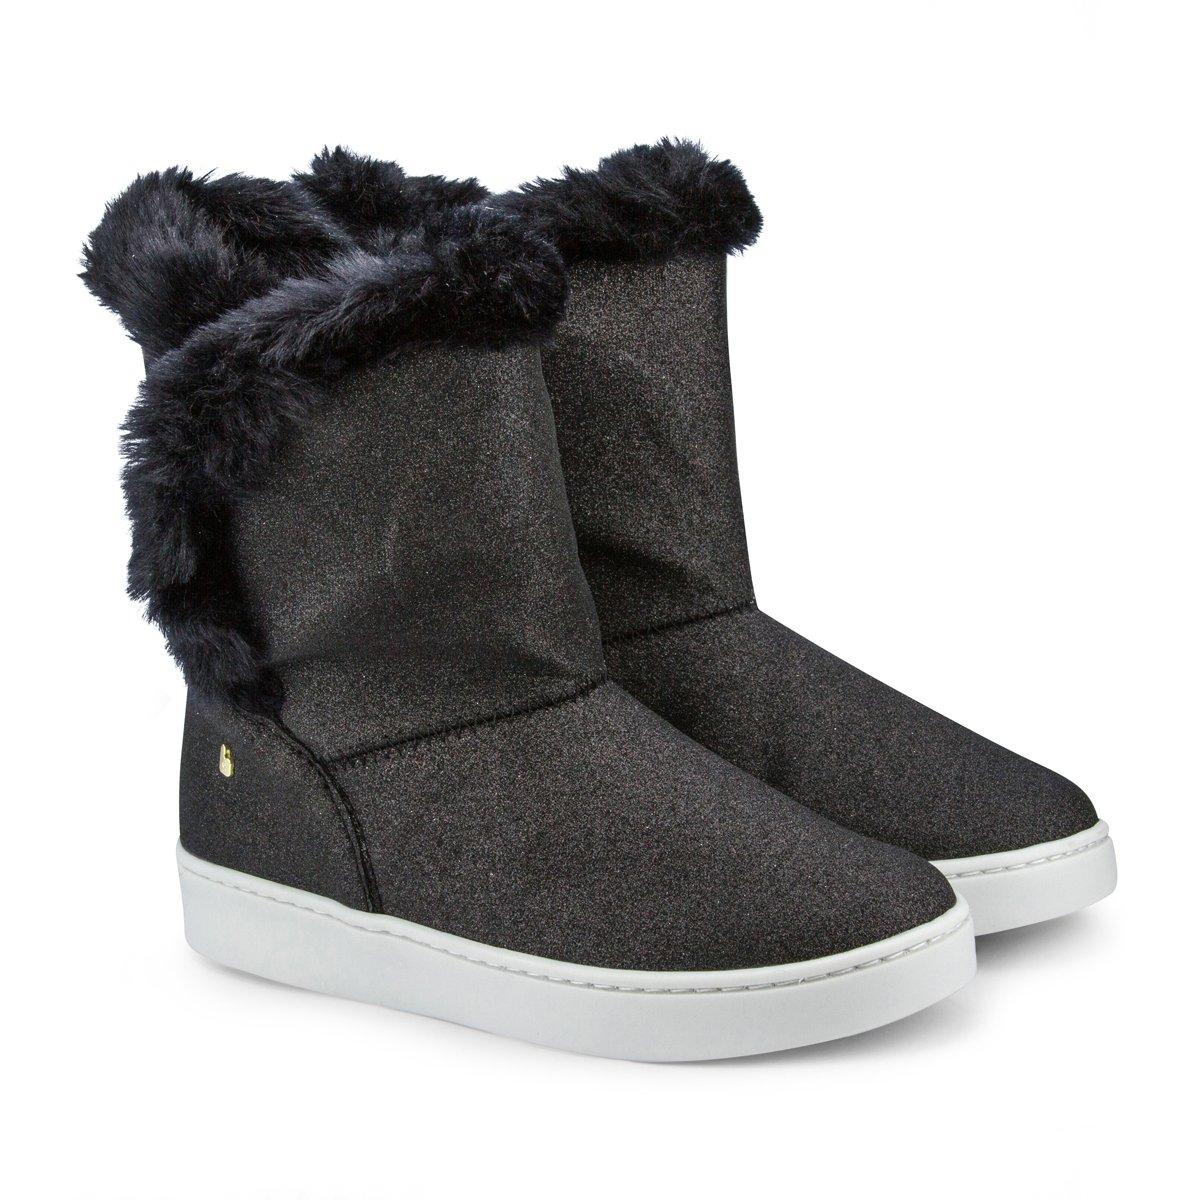 Cizme cu sclipici Bibi Shoes Urban Black imagine